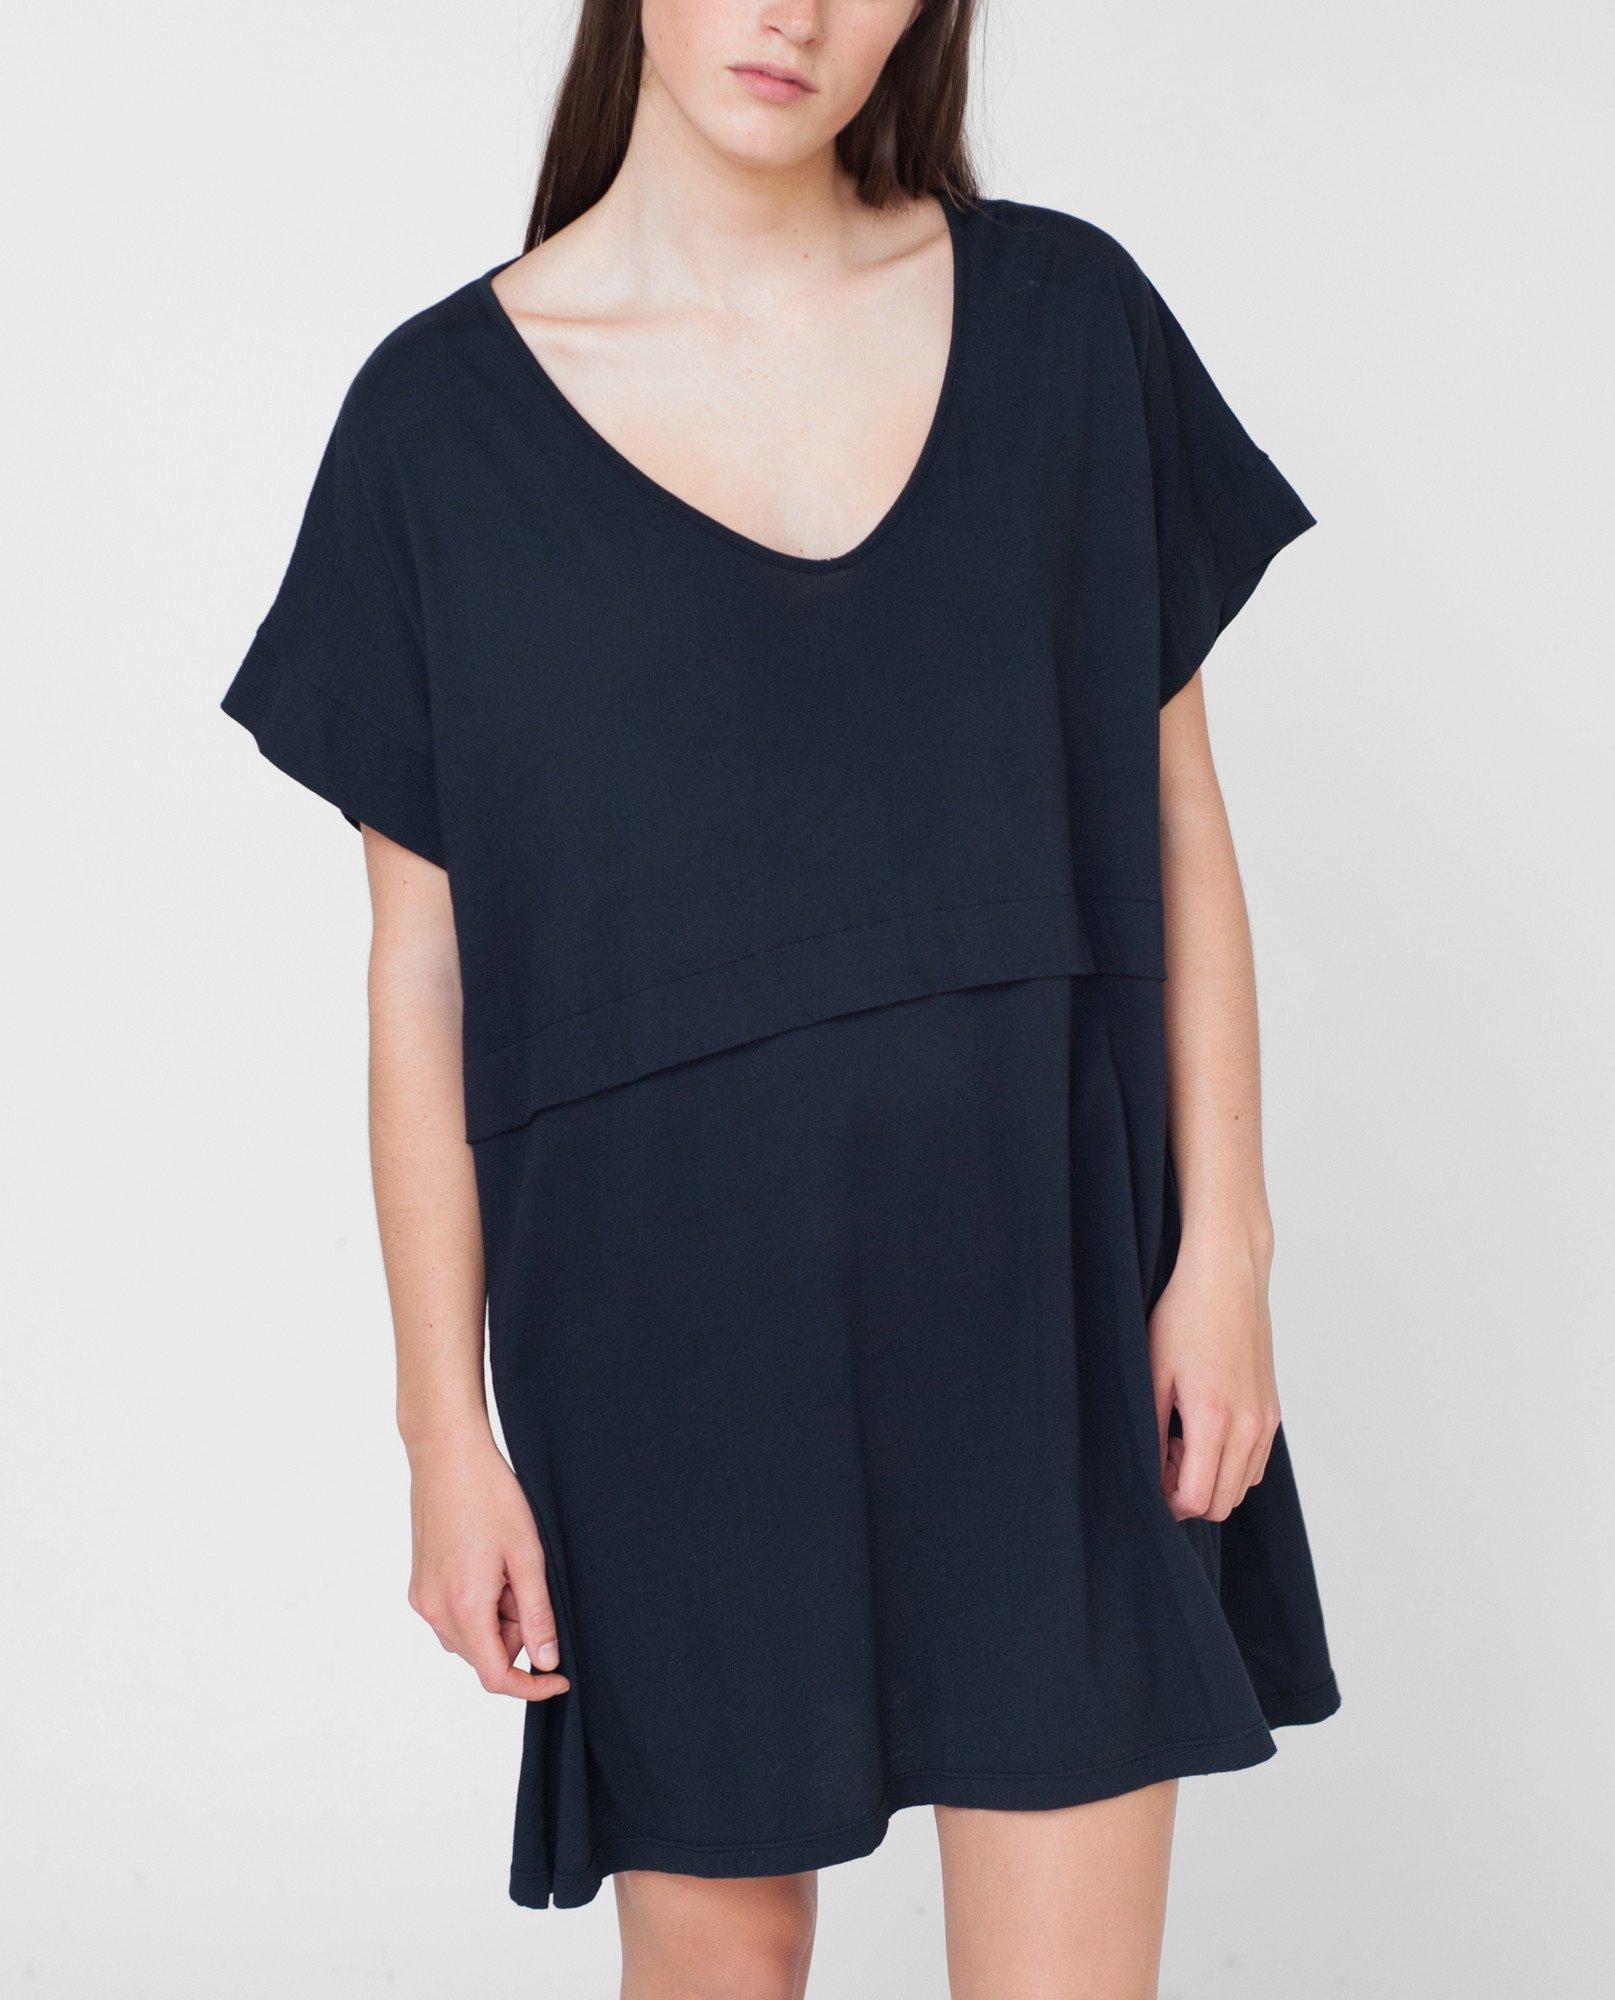 CHARLOTTE Organic Cotton Tunic Dress from Beaumont Organic